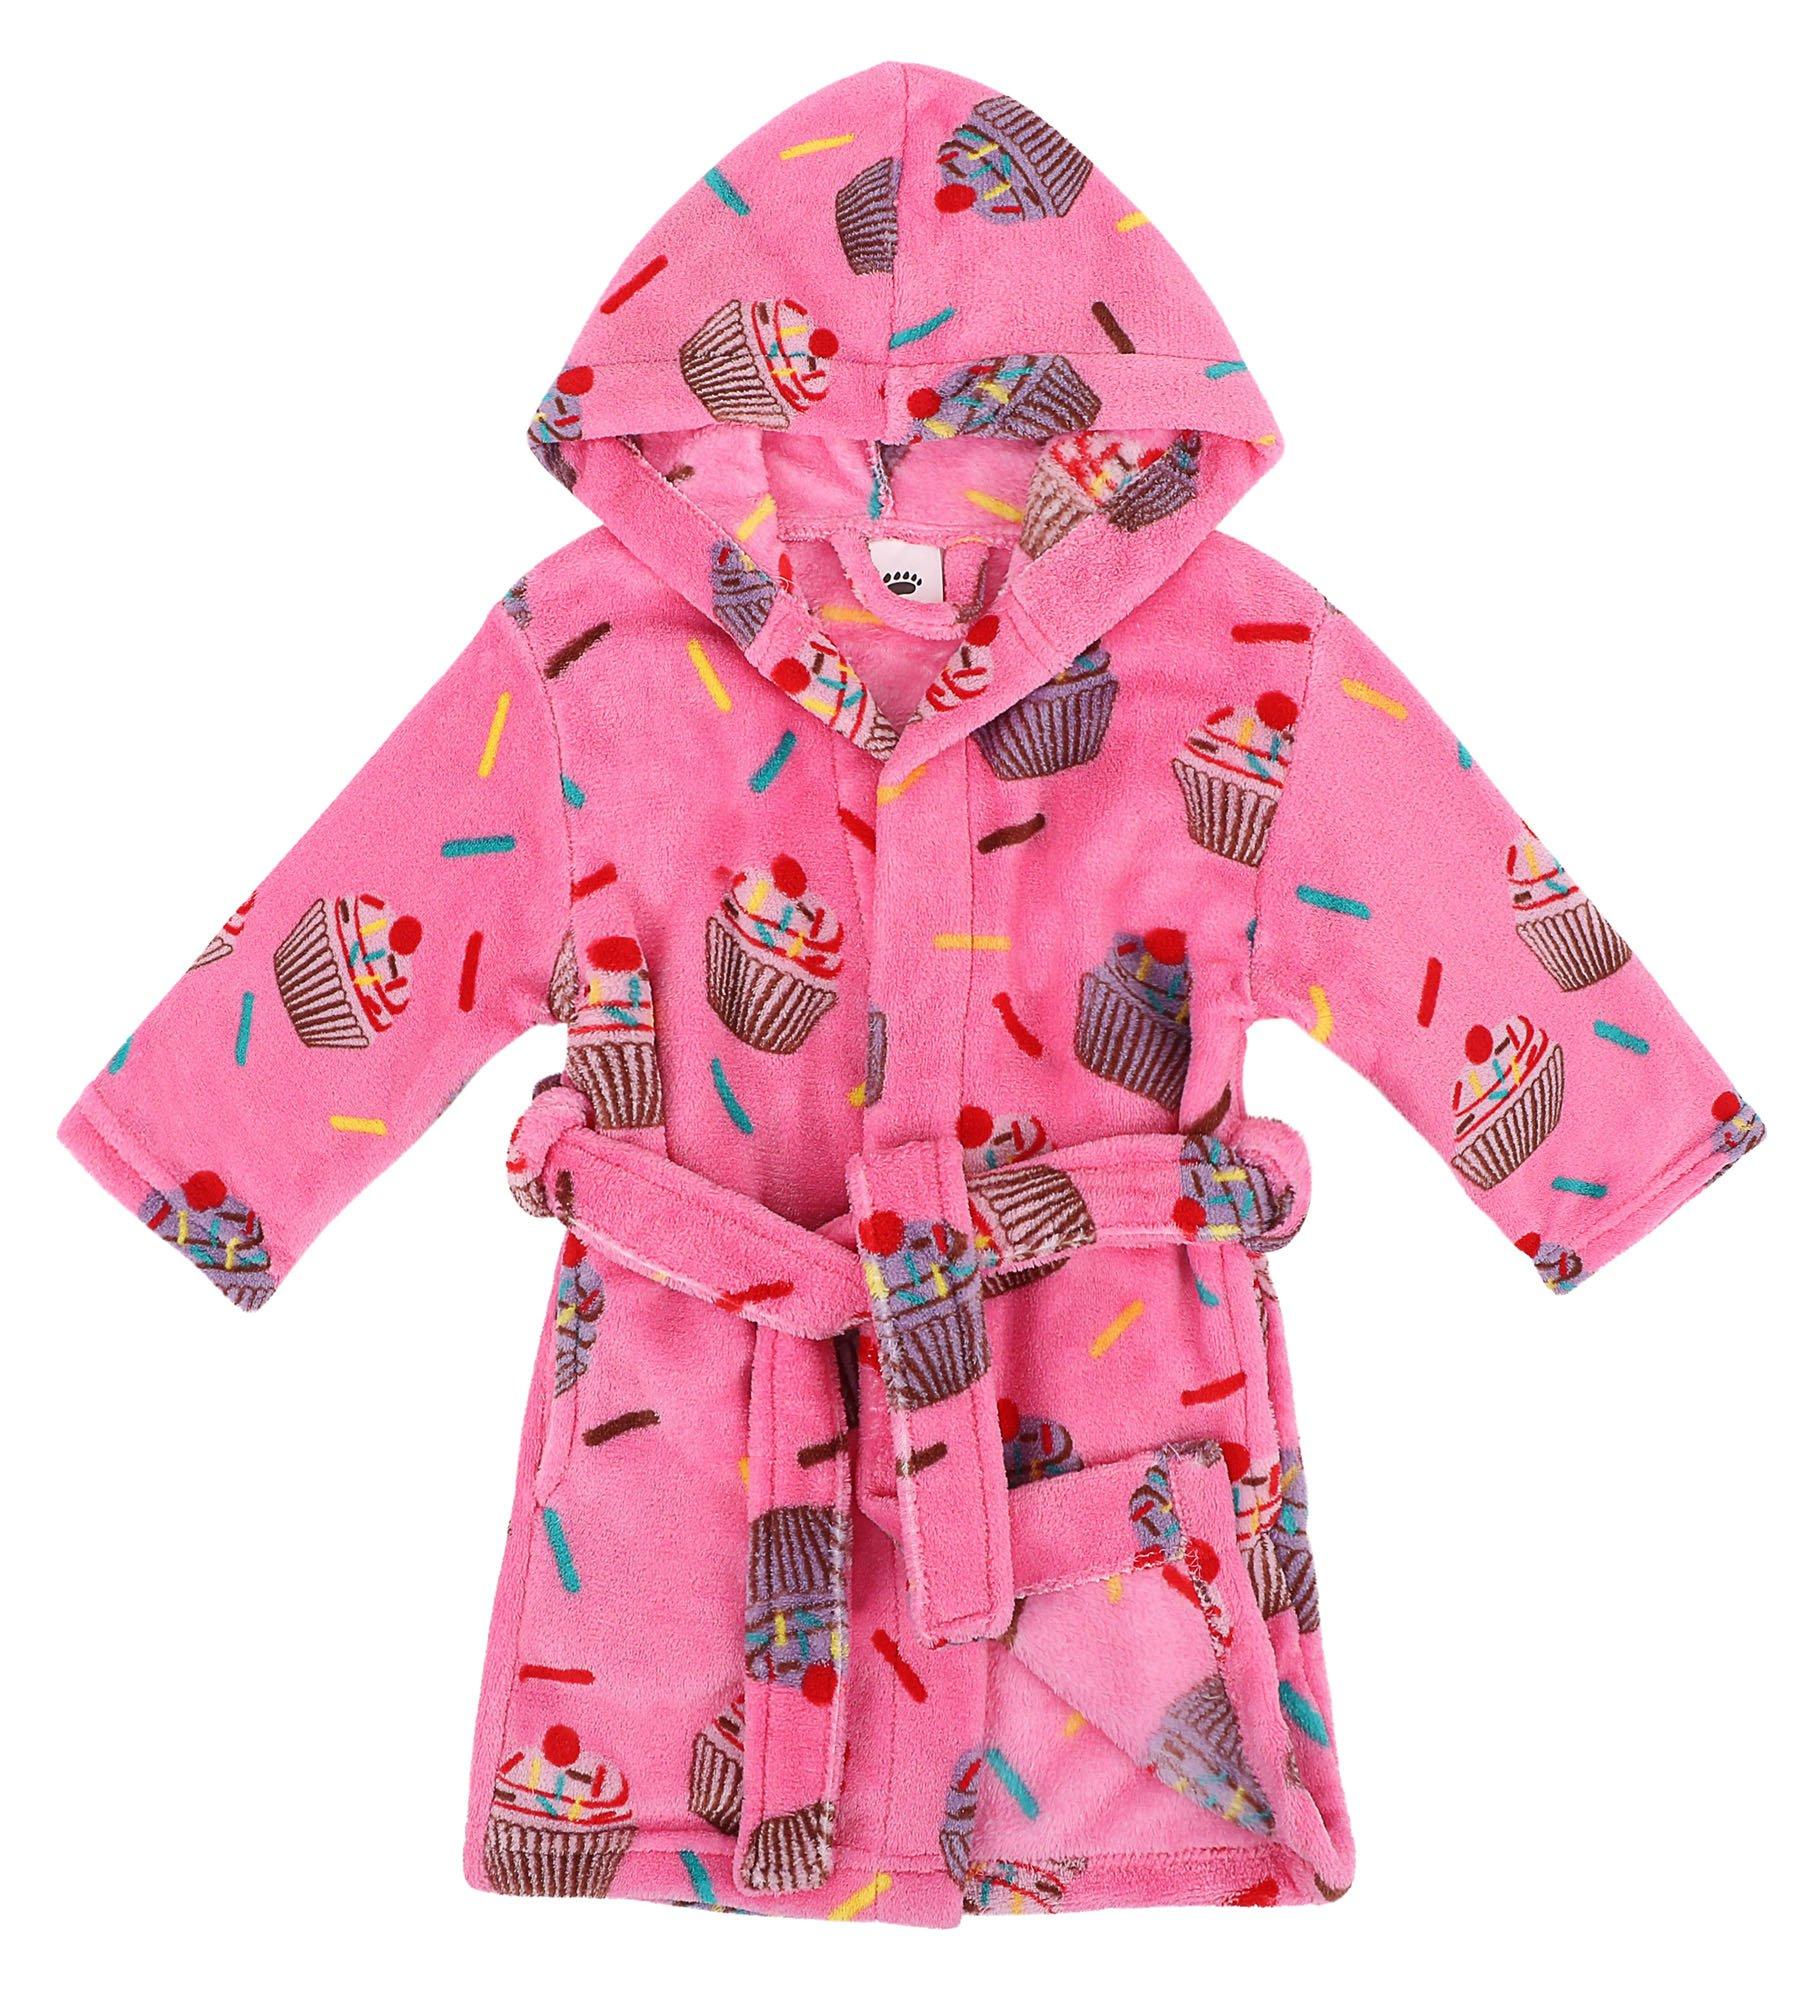 Verabella Kids Robes with Hood Plush Soft Fleece Hooded Bathrobes Robe,Pink,L